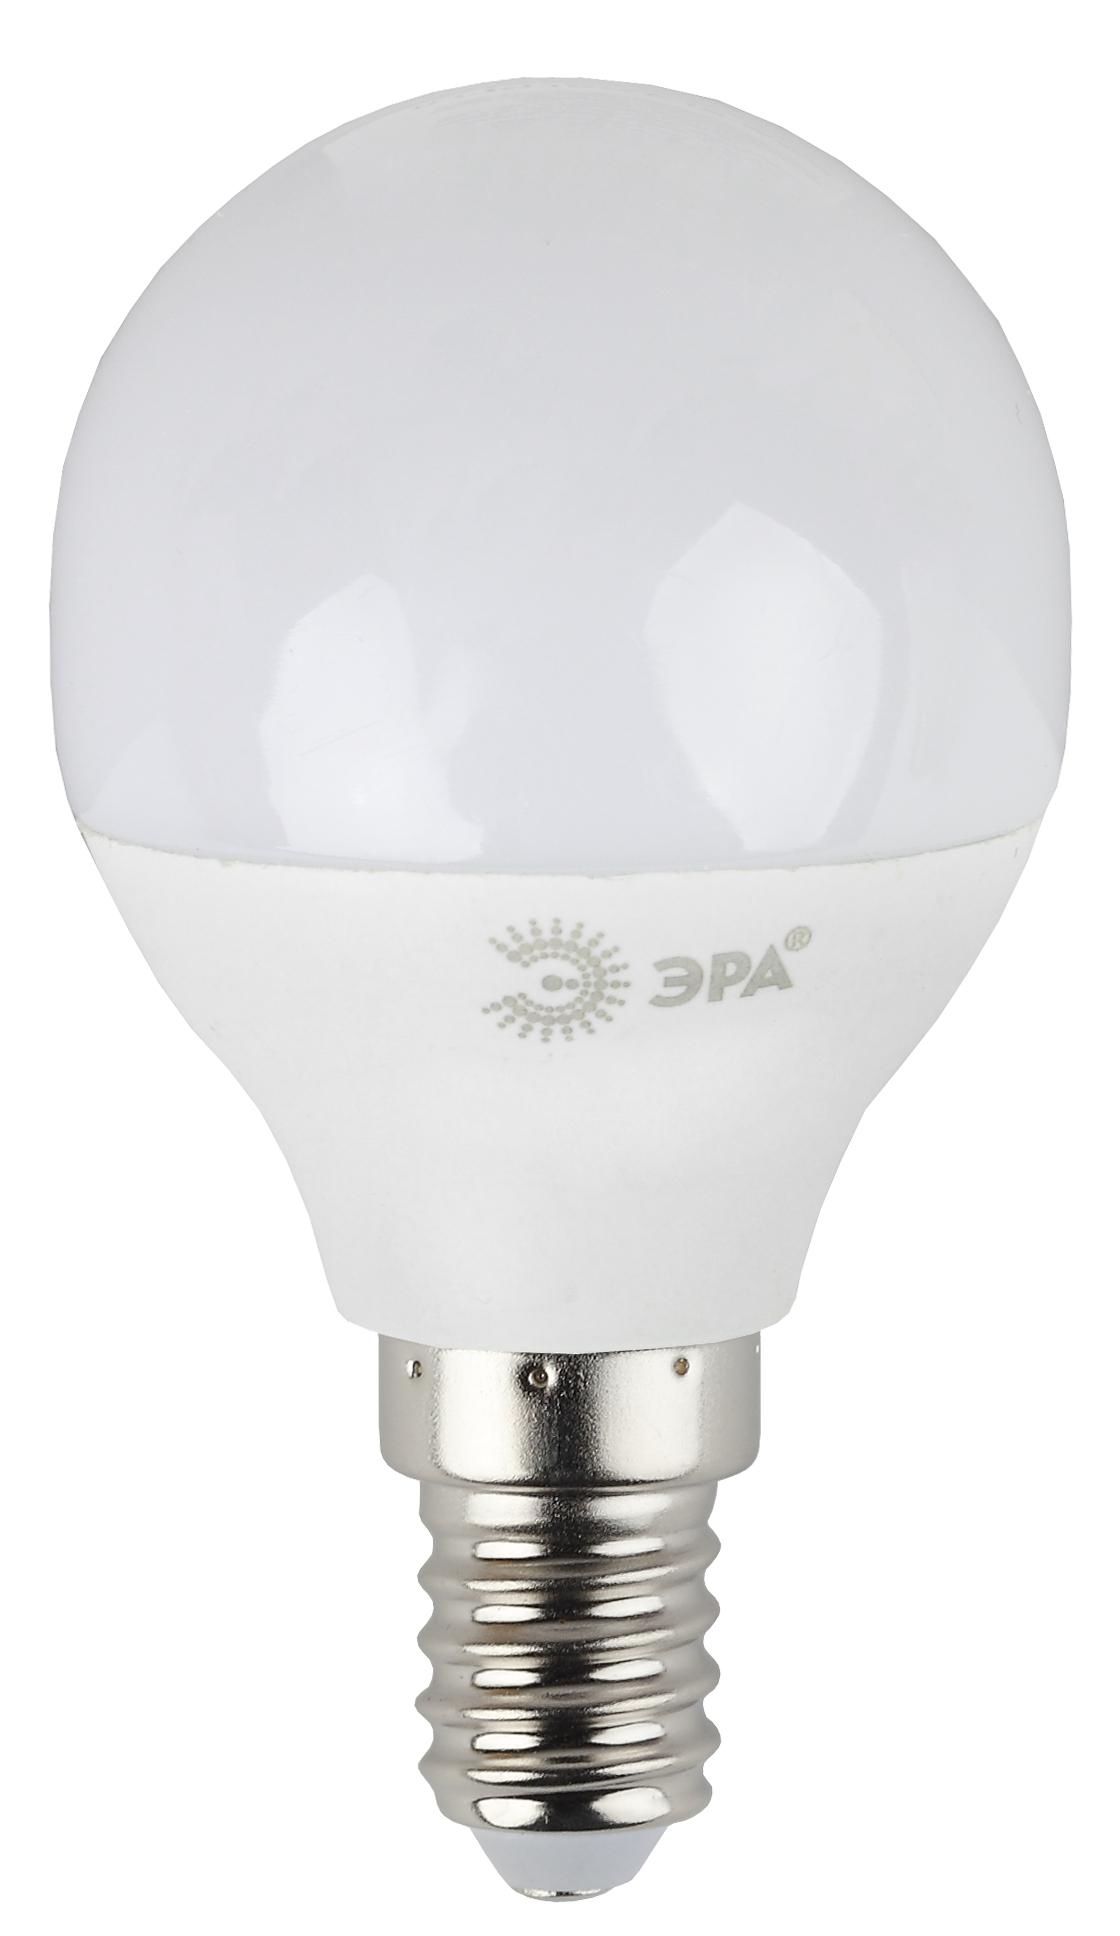 Лампа светодиодная ЭРА Led smd p45-7w-860-e14